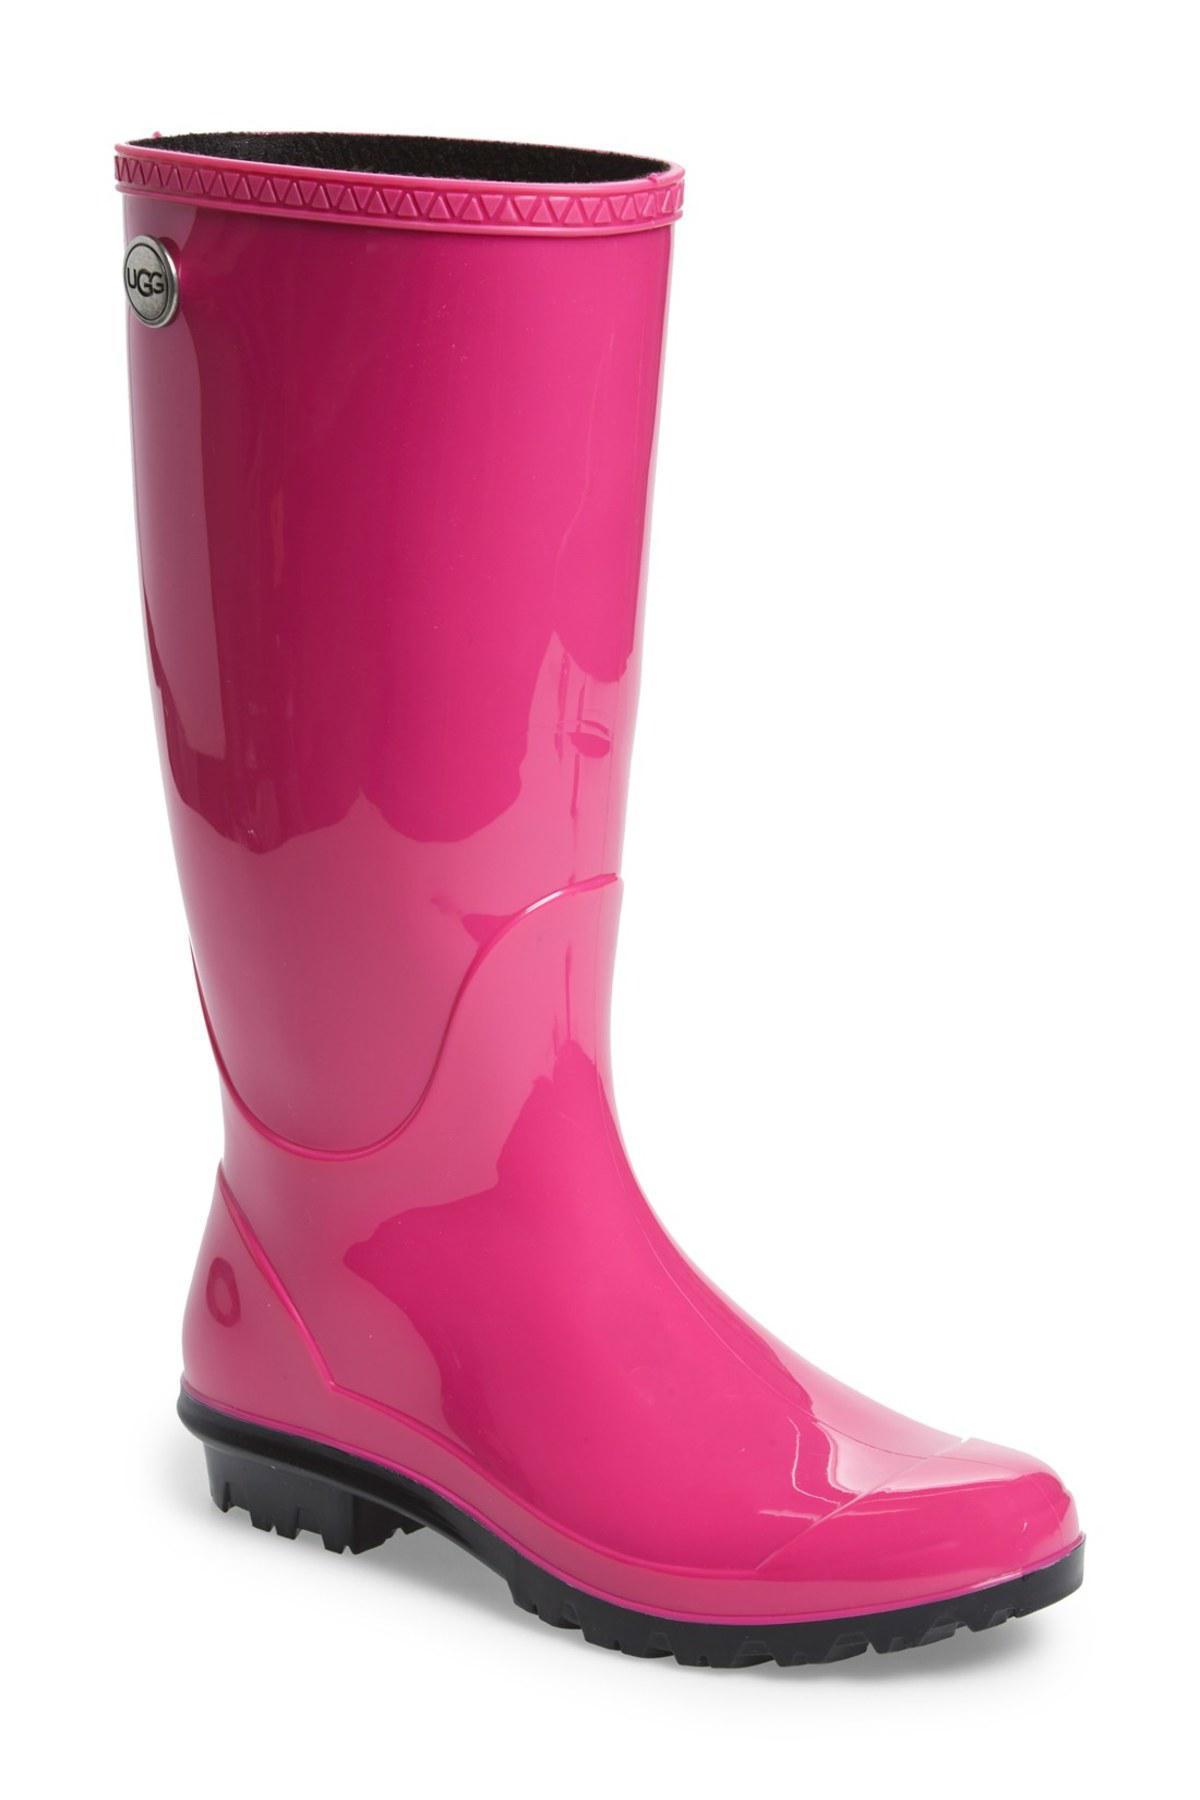 205c61762b3 Lyst - UGG Shaye Waterproof Rain Boot in Pink